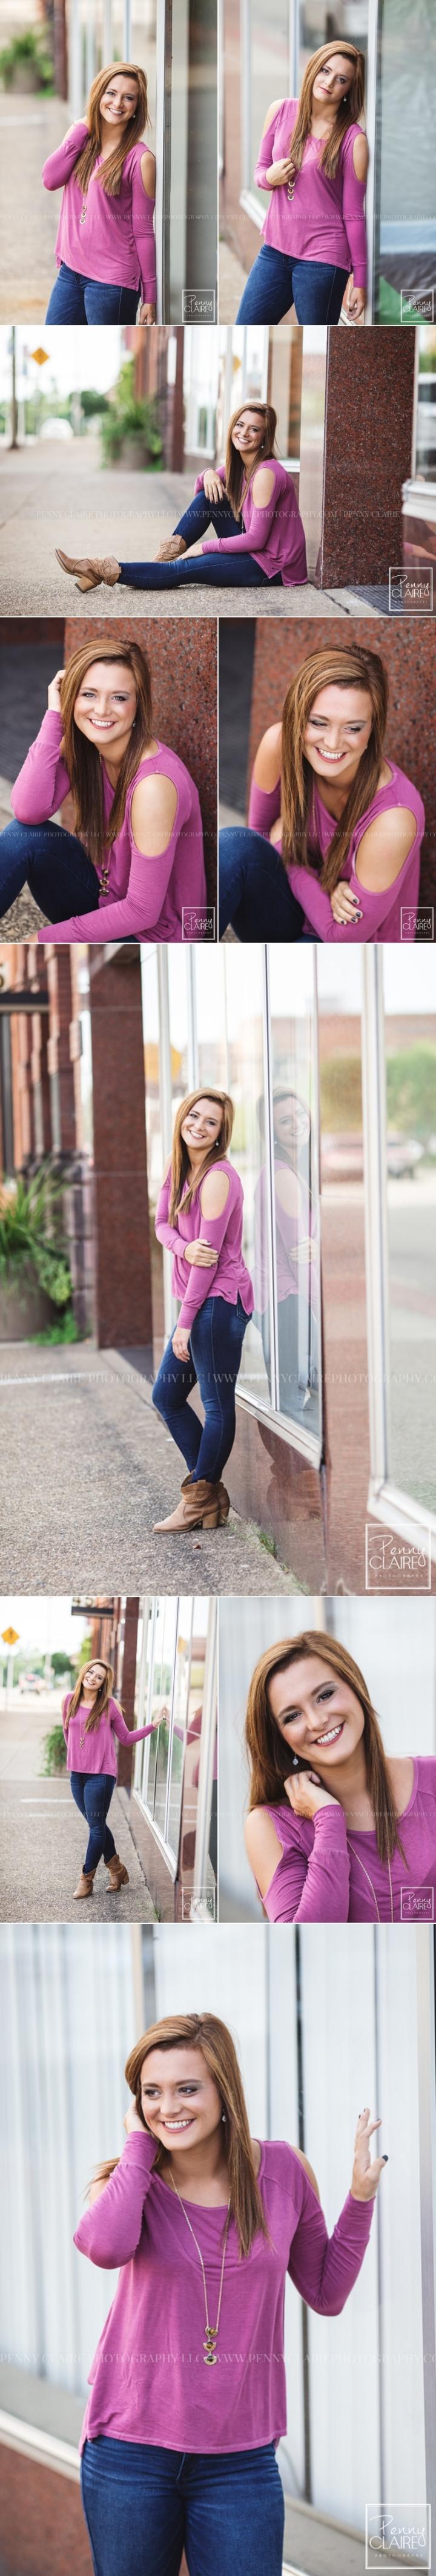 high-school-senior-photos-pennyclaire-1